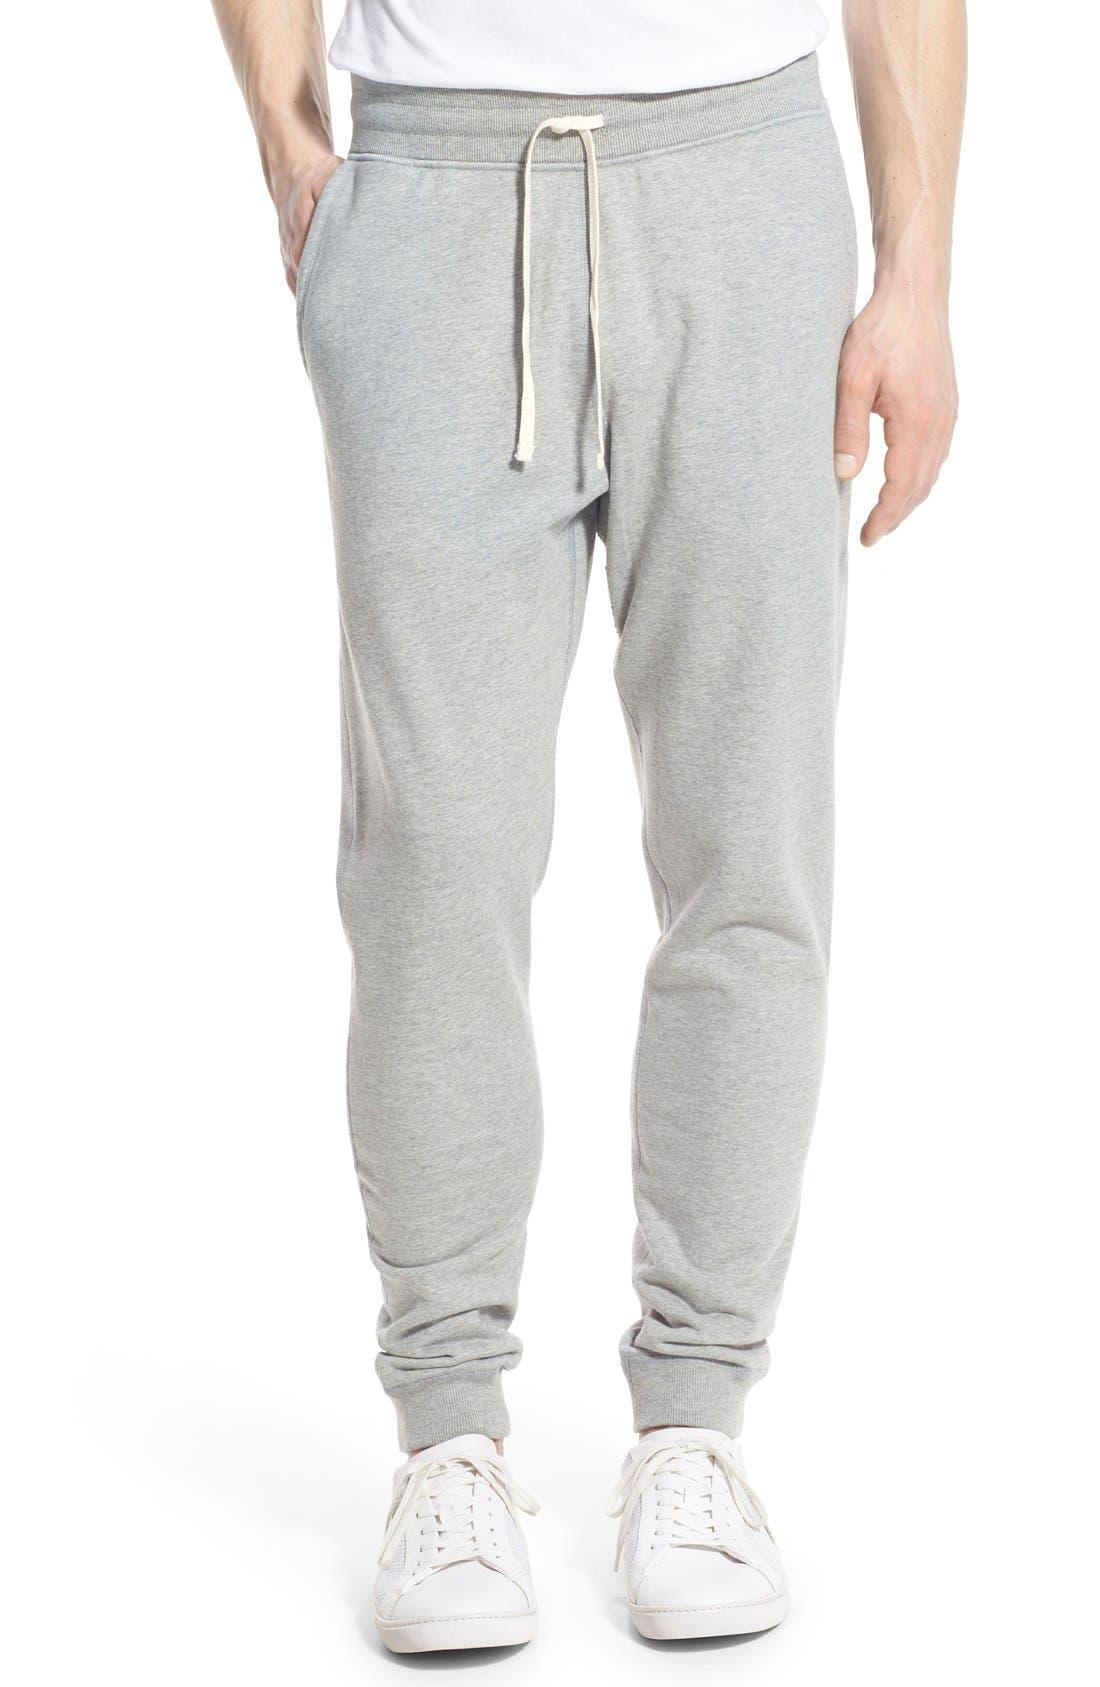 Alternate Image 1 Selected - Reigning Champ Slim Fit Sweatpants